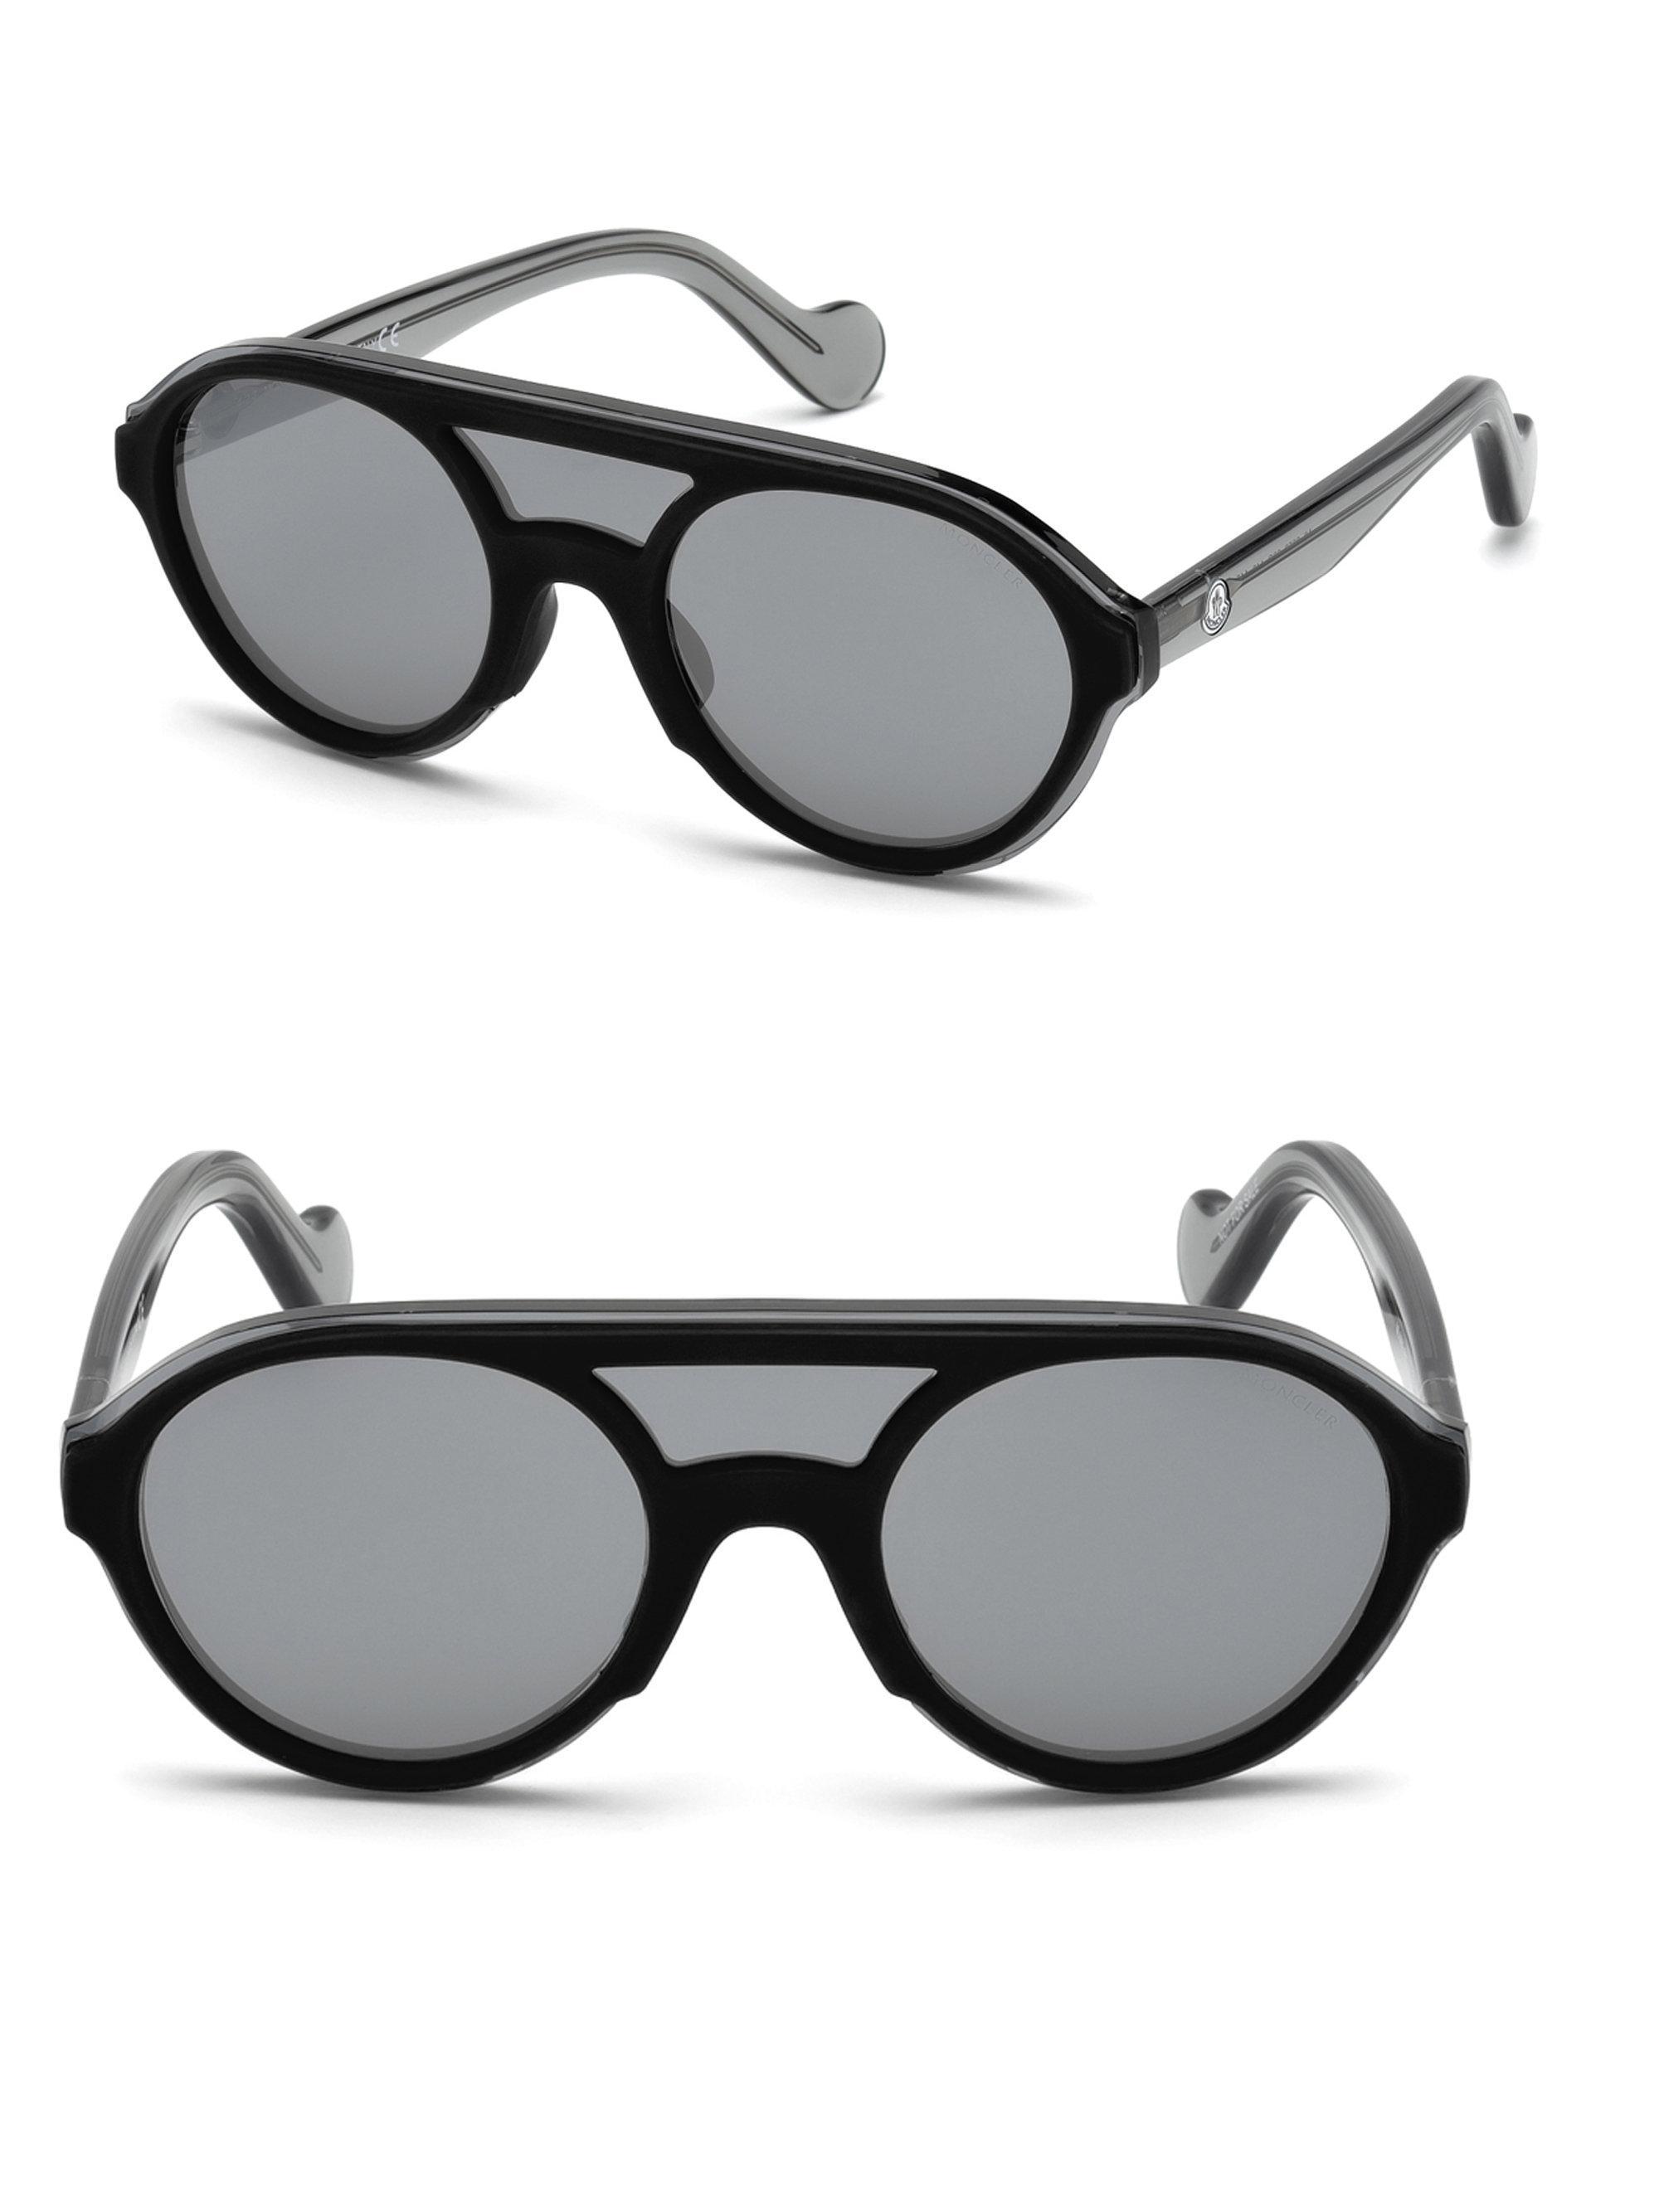 04ea8ecc9bd Moncler 47mm Double Bridge Round Sunglasses in Gray - Save 8% - Lyst